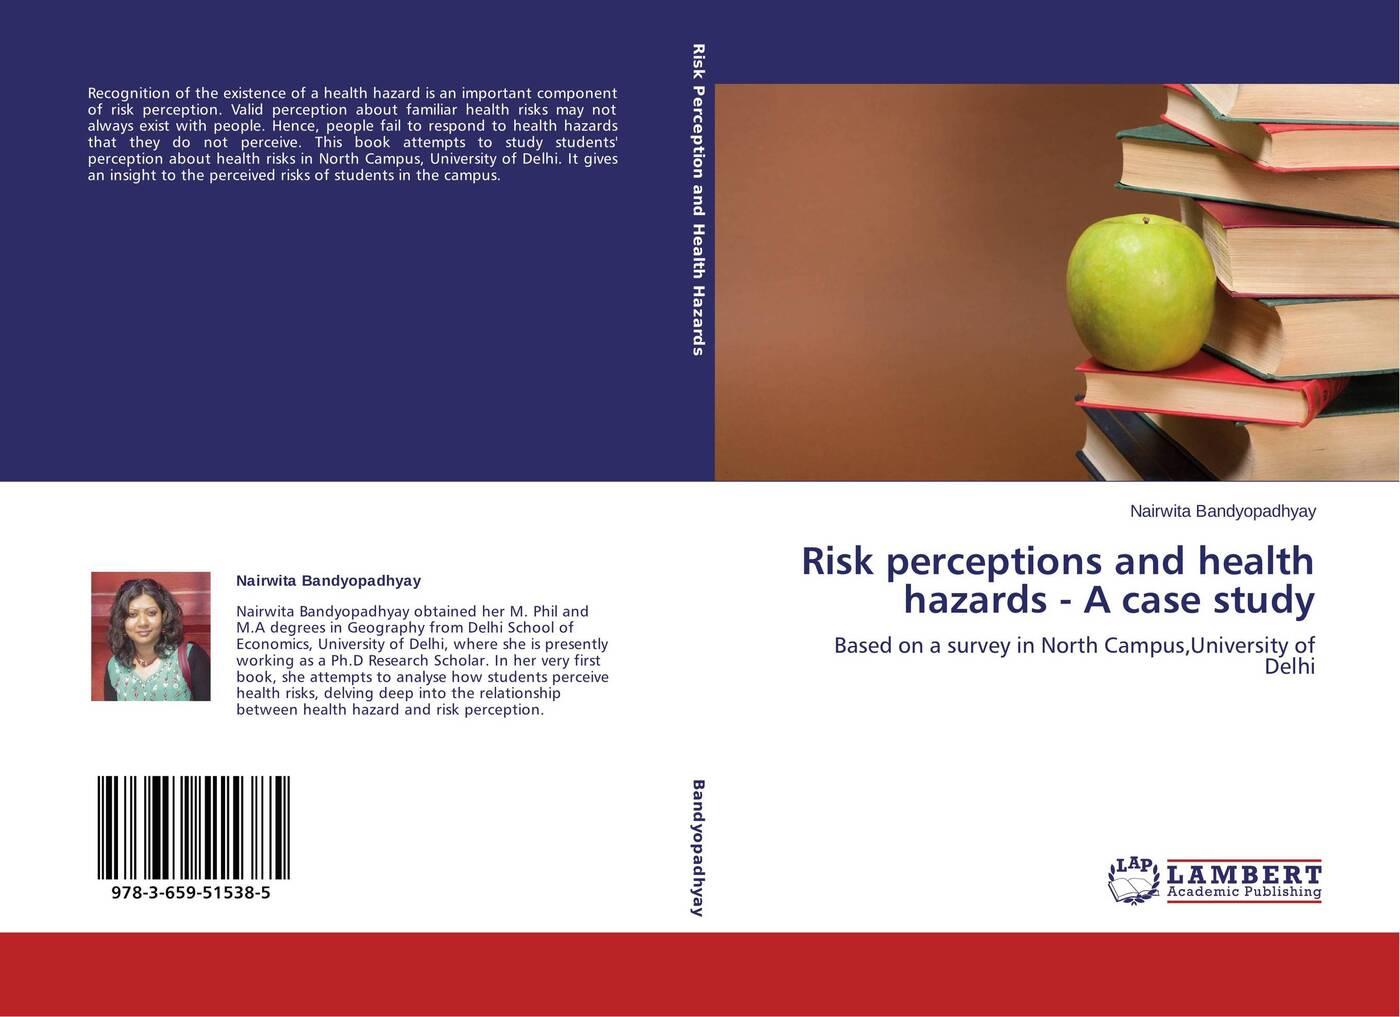 Nairwita Bandyopadhyay Risk perceptions and health hazards - A case study harole yoseph gebregziabhire understanding mothers perception about malnutrition